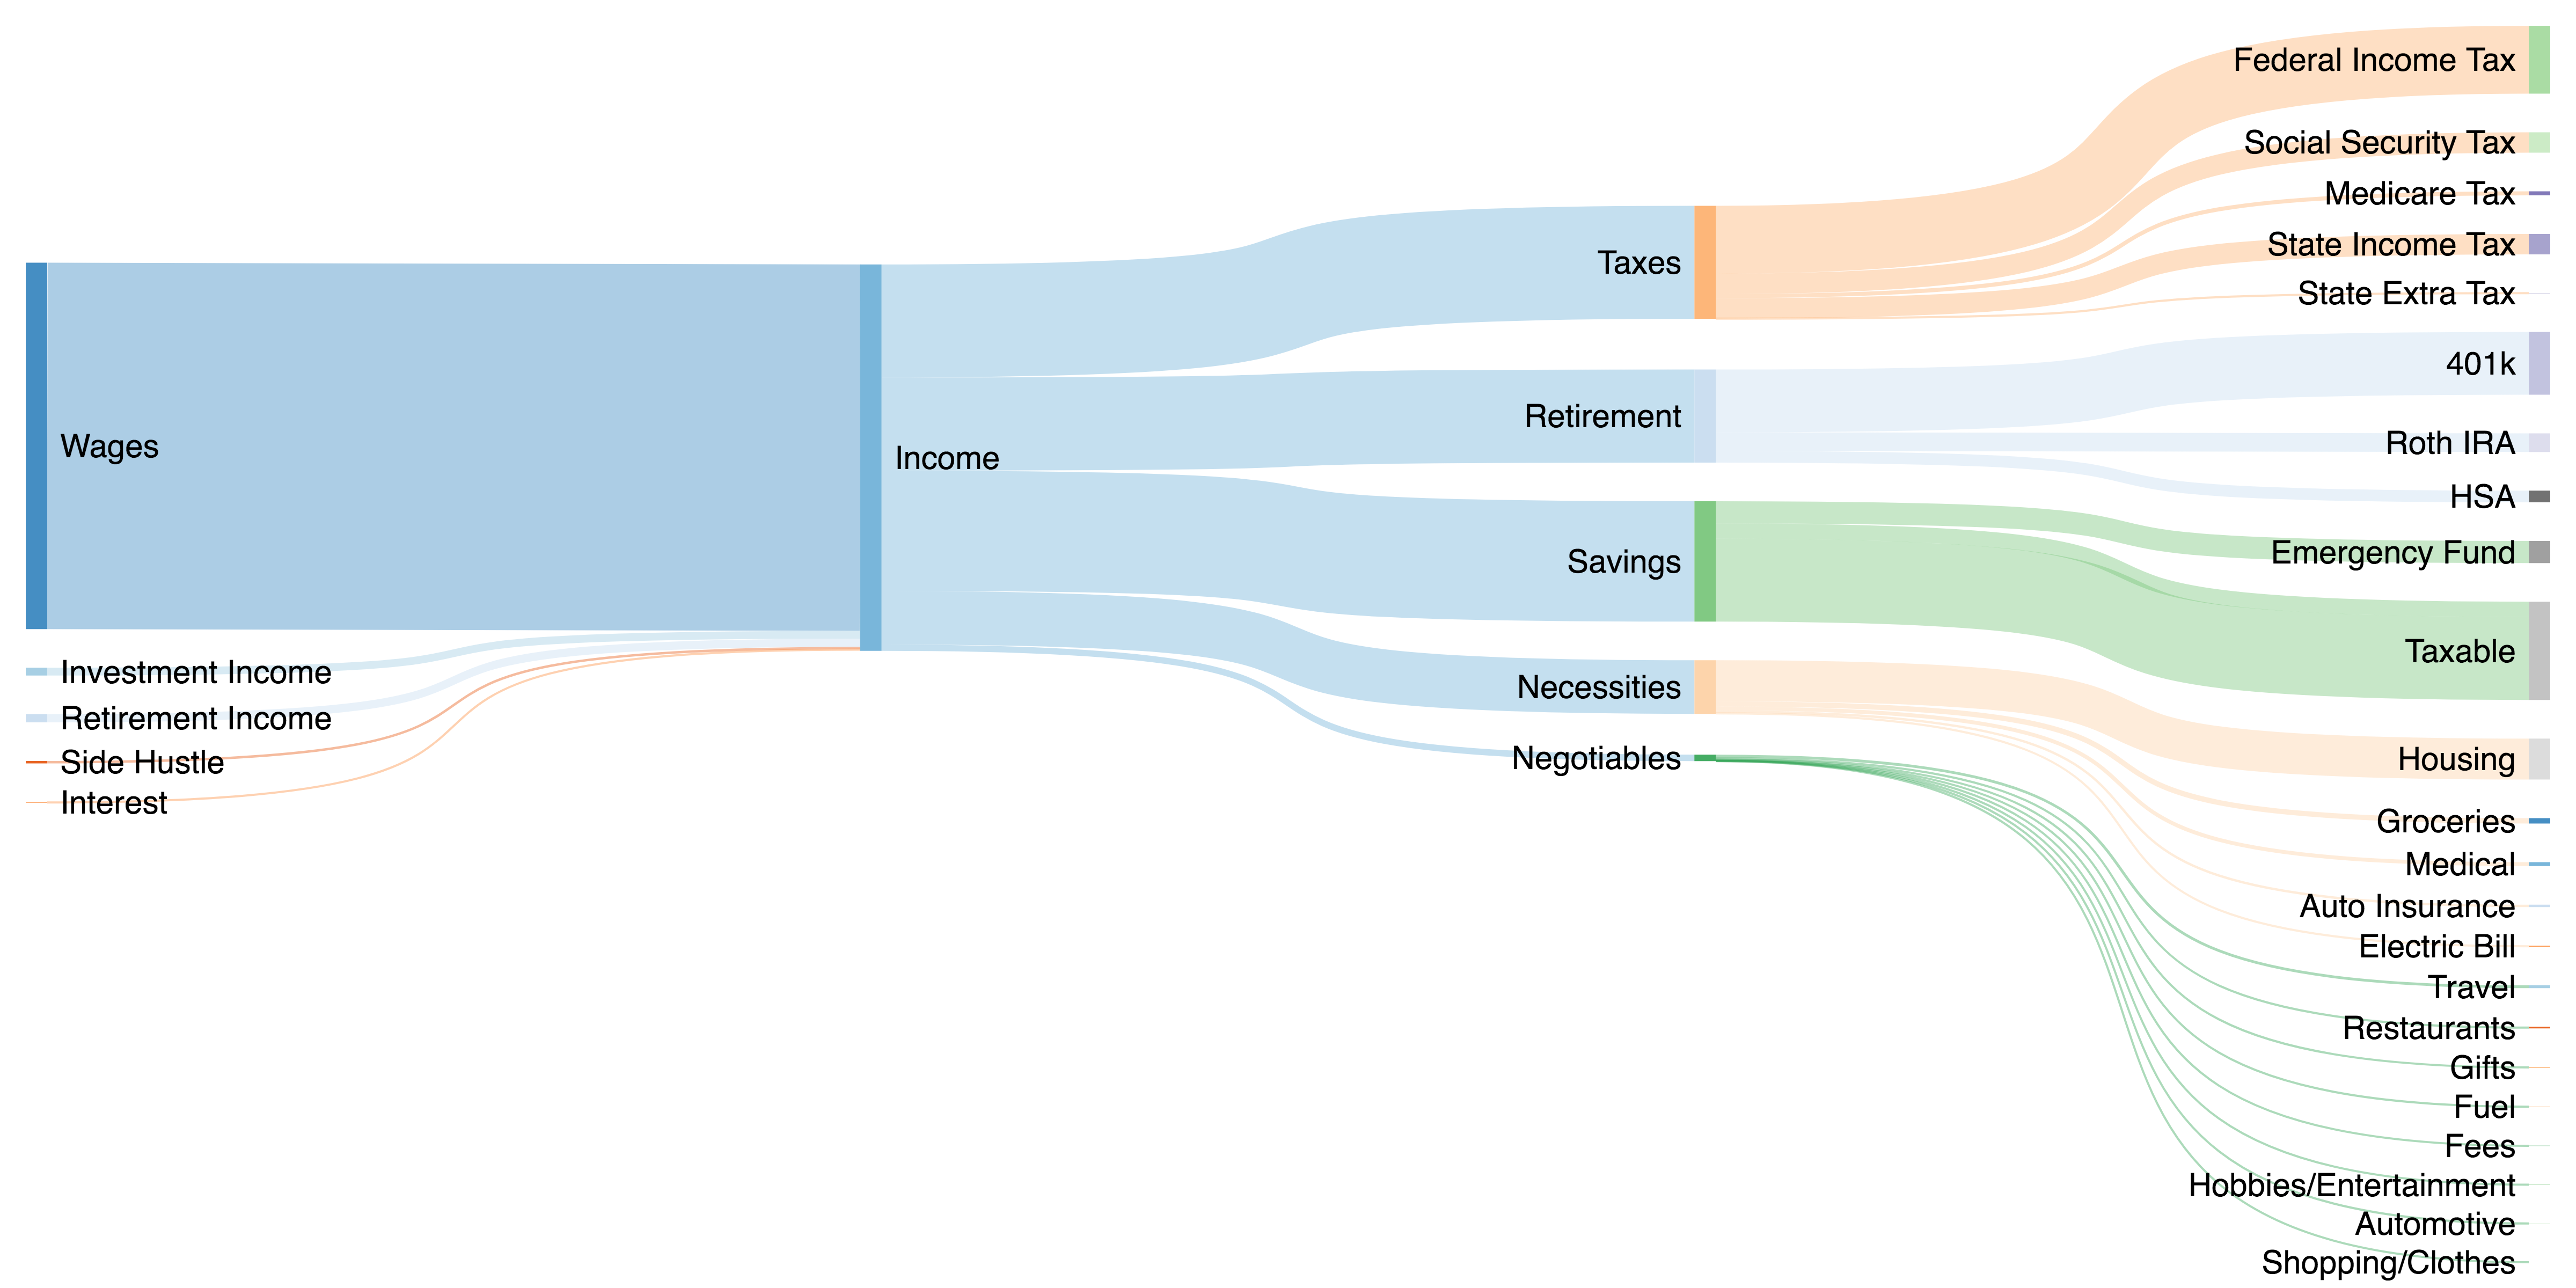 diagram of spending breakdown in 2018